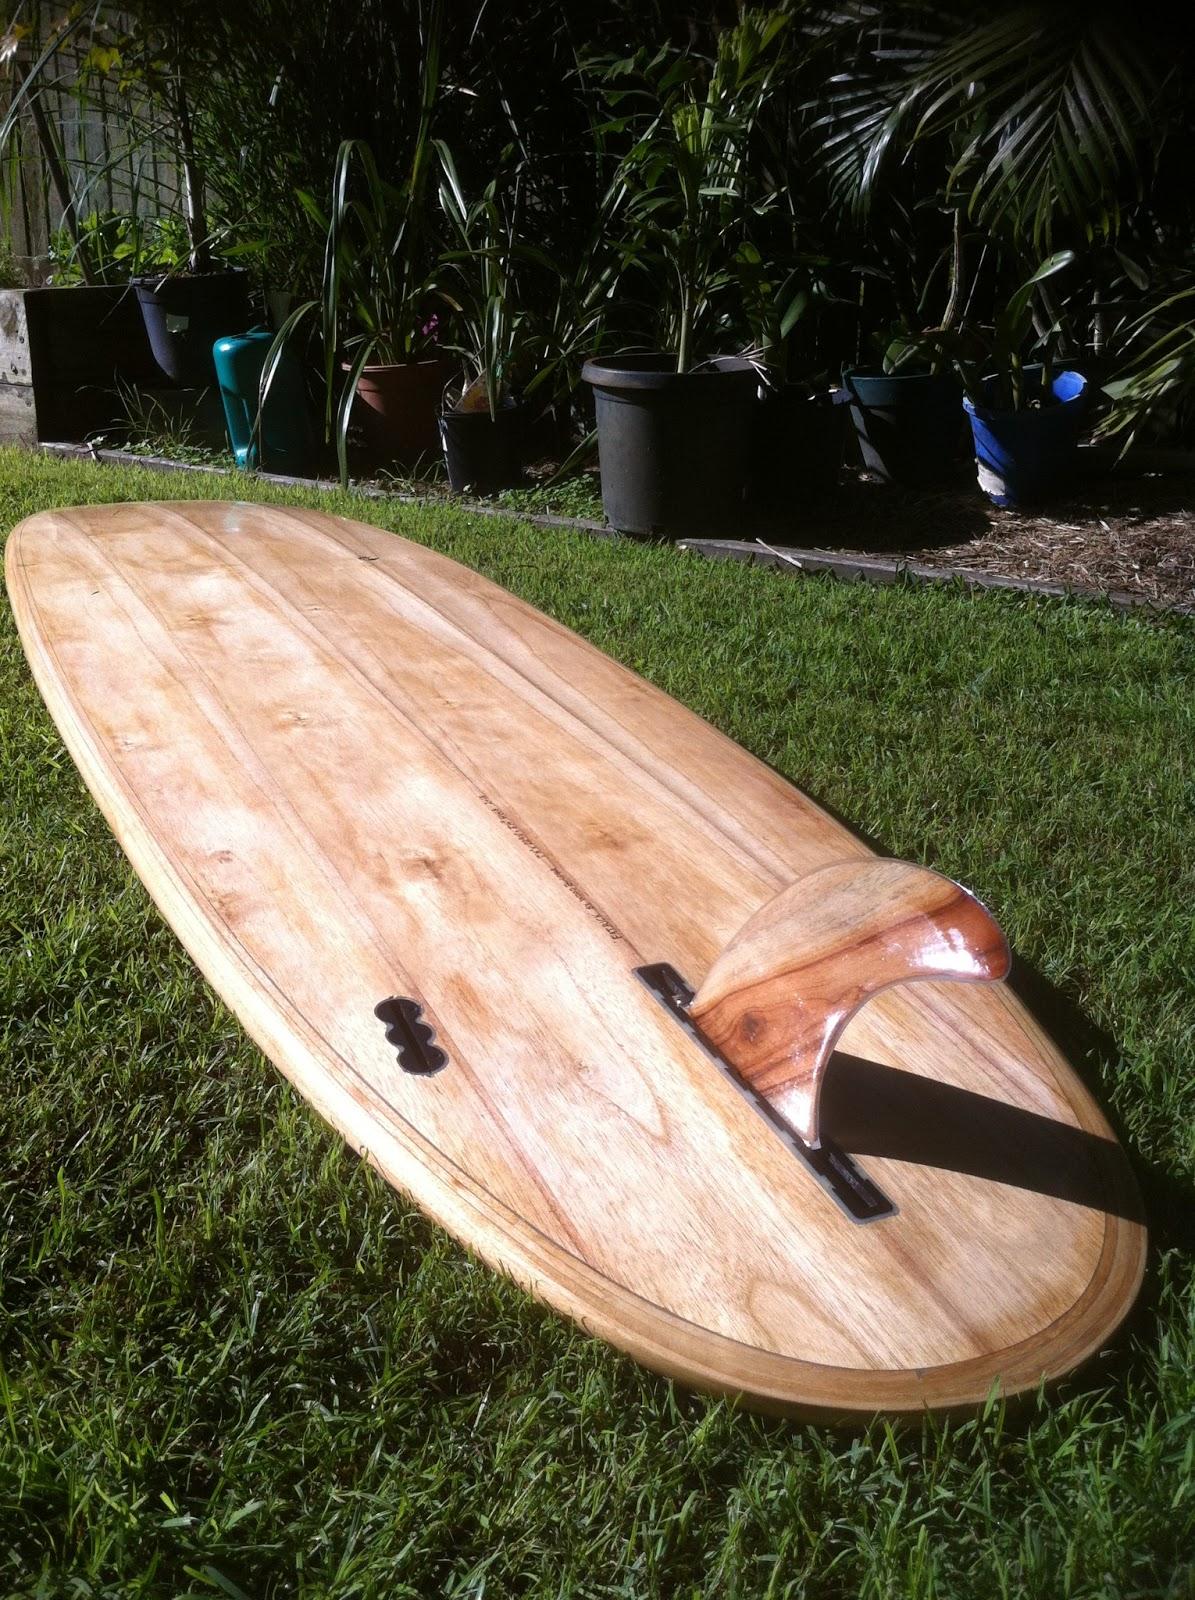 building a hollow wooden surfboard pdf